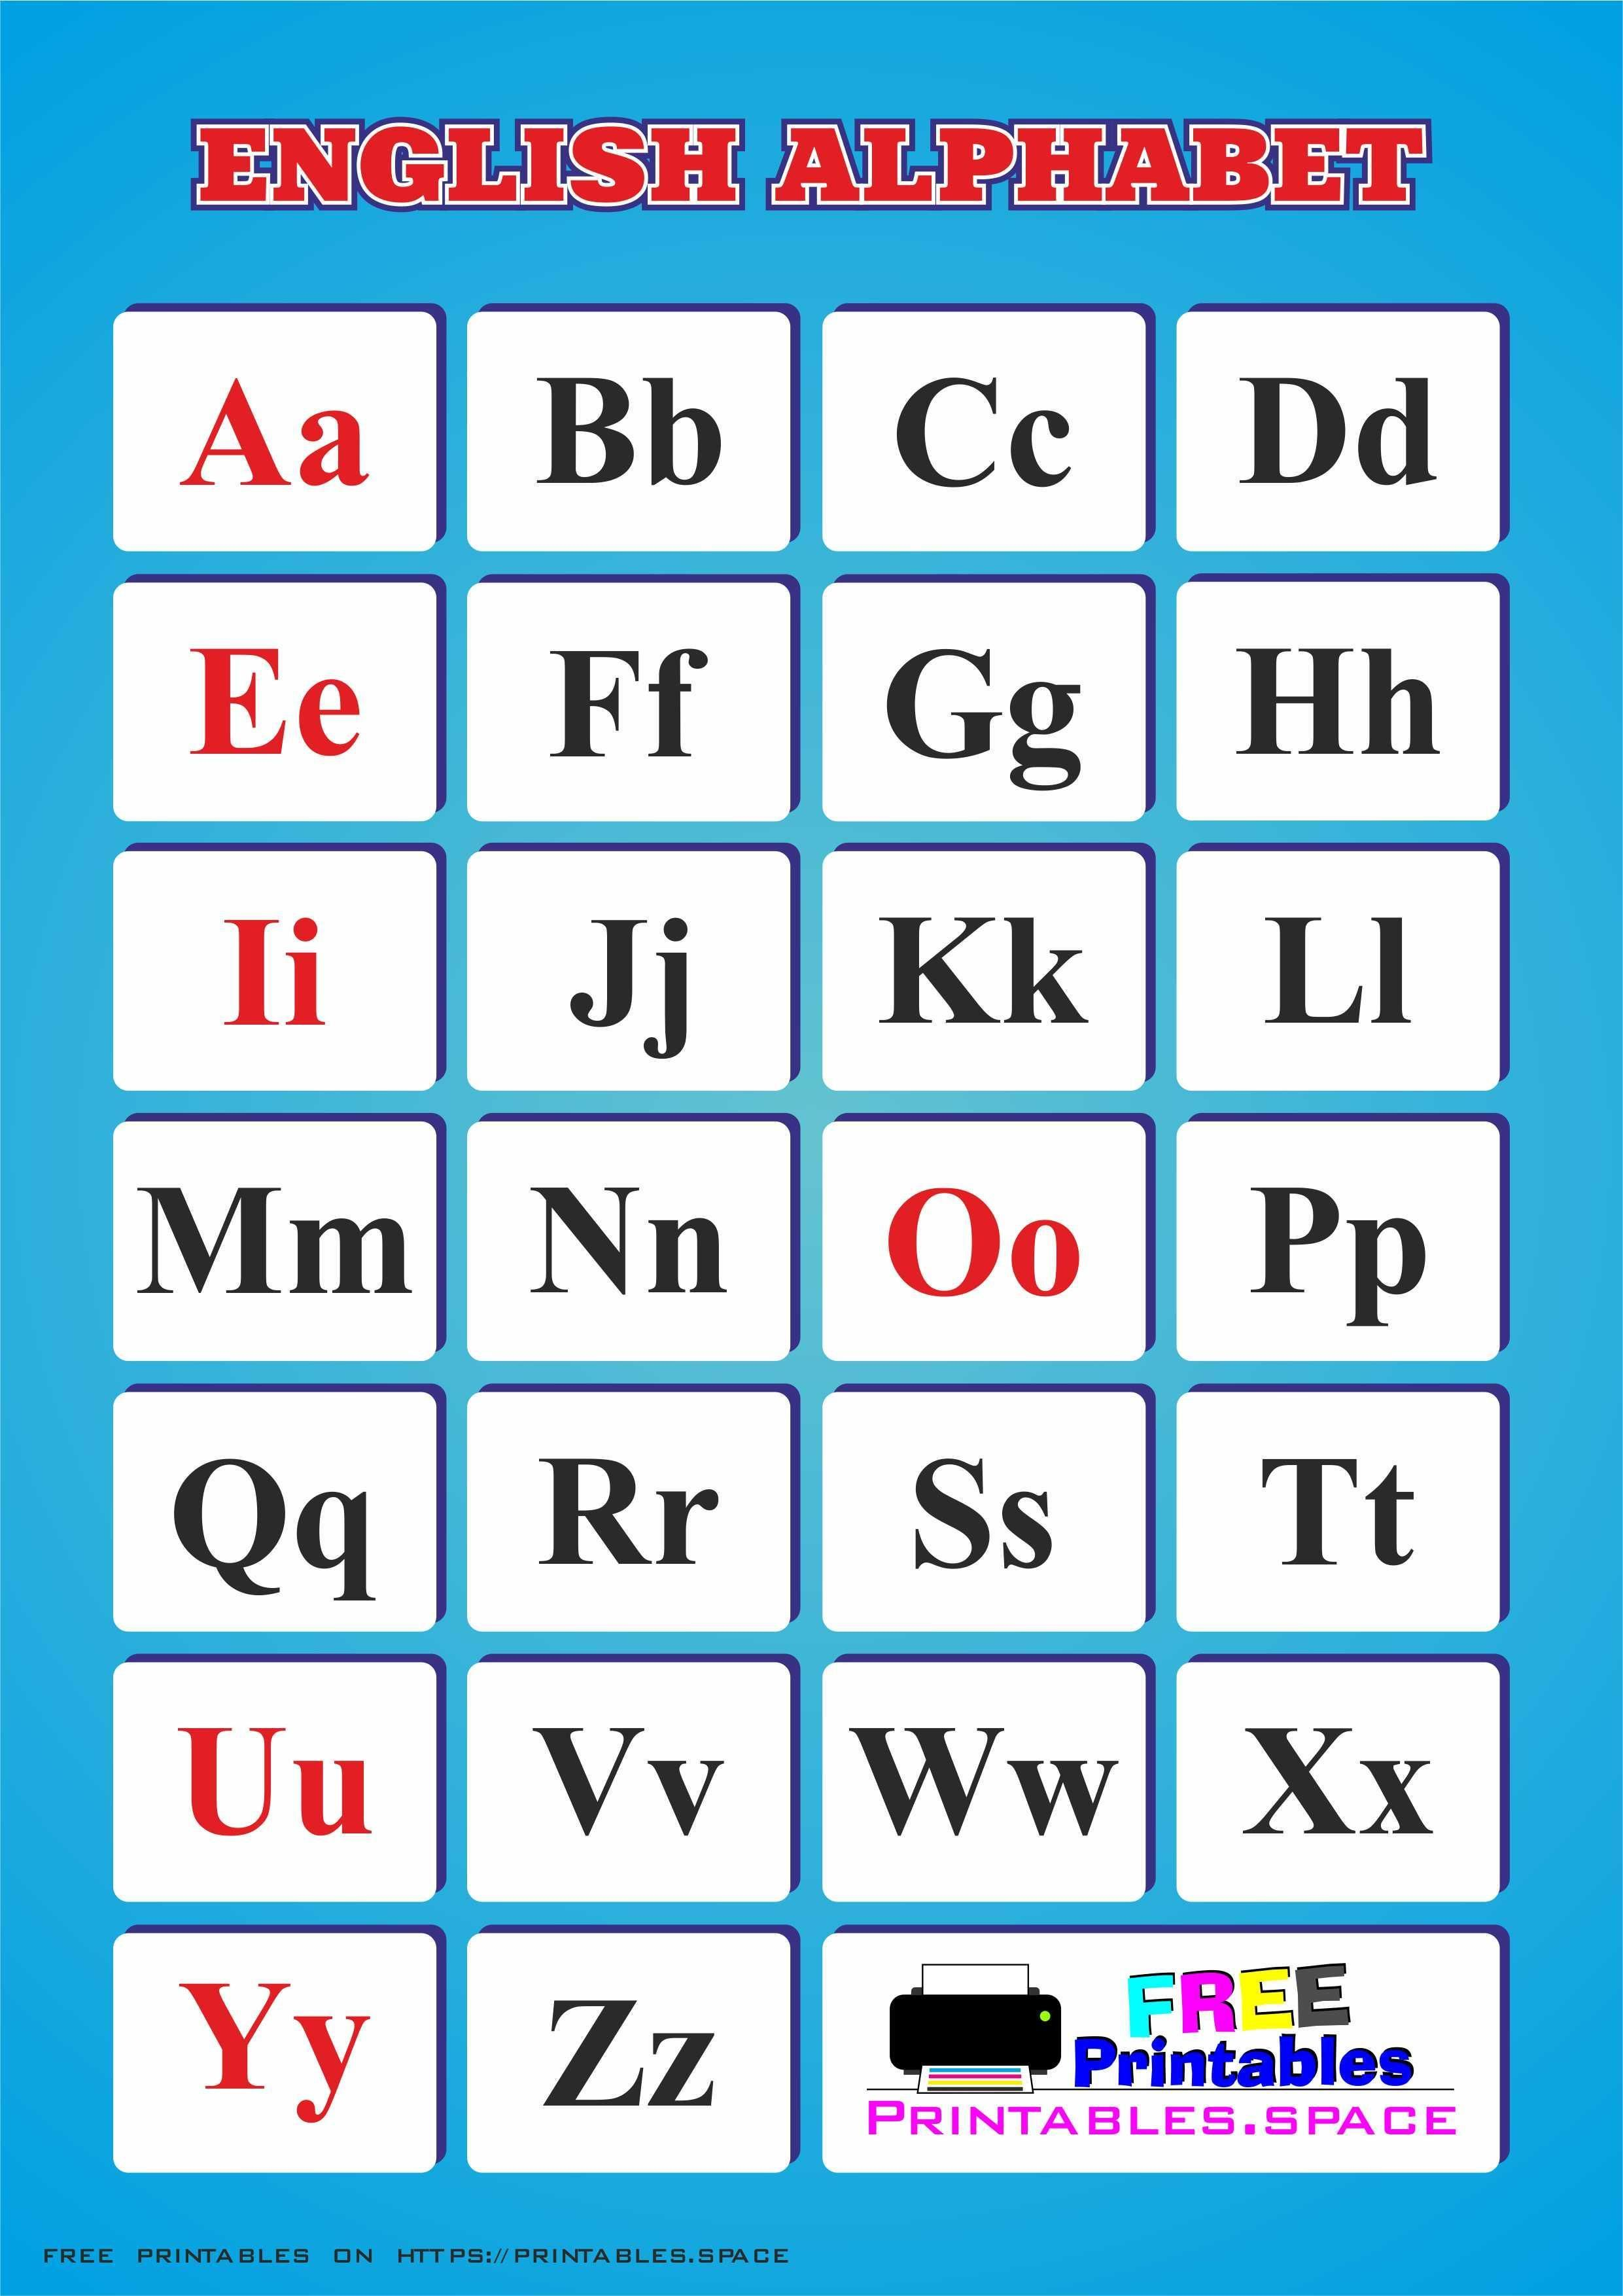 English Alphabet Printable In